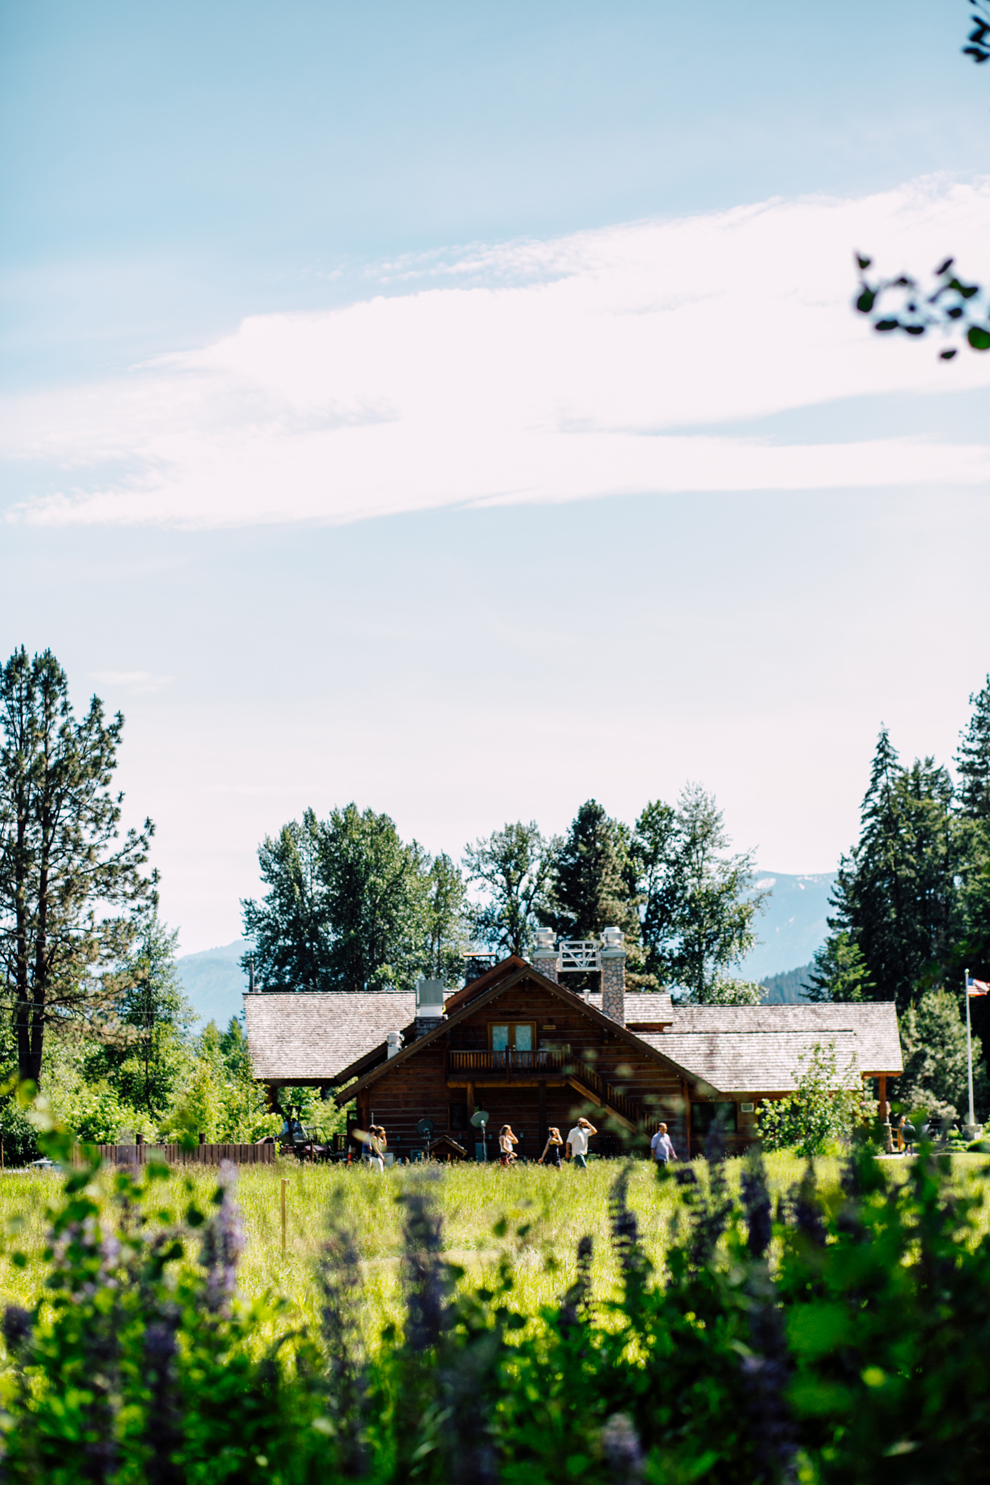 058-leavenworth-mountain-springs-lodge-wedding-karena-saul-katheryn-moran-photography.jpg